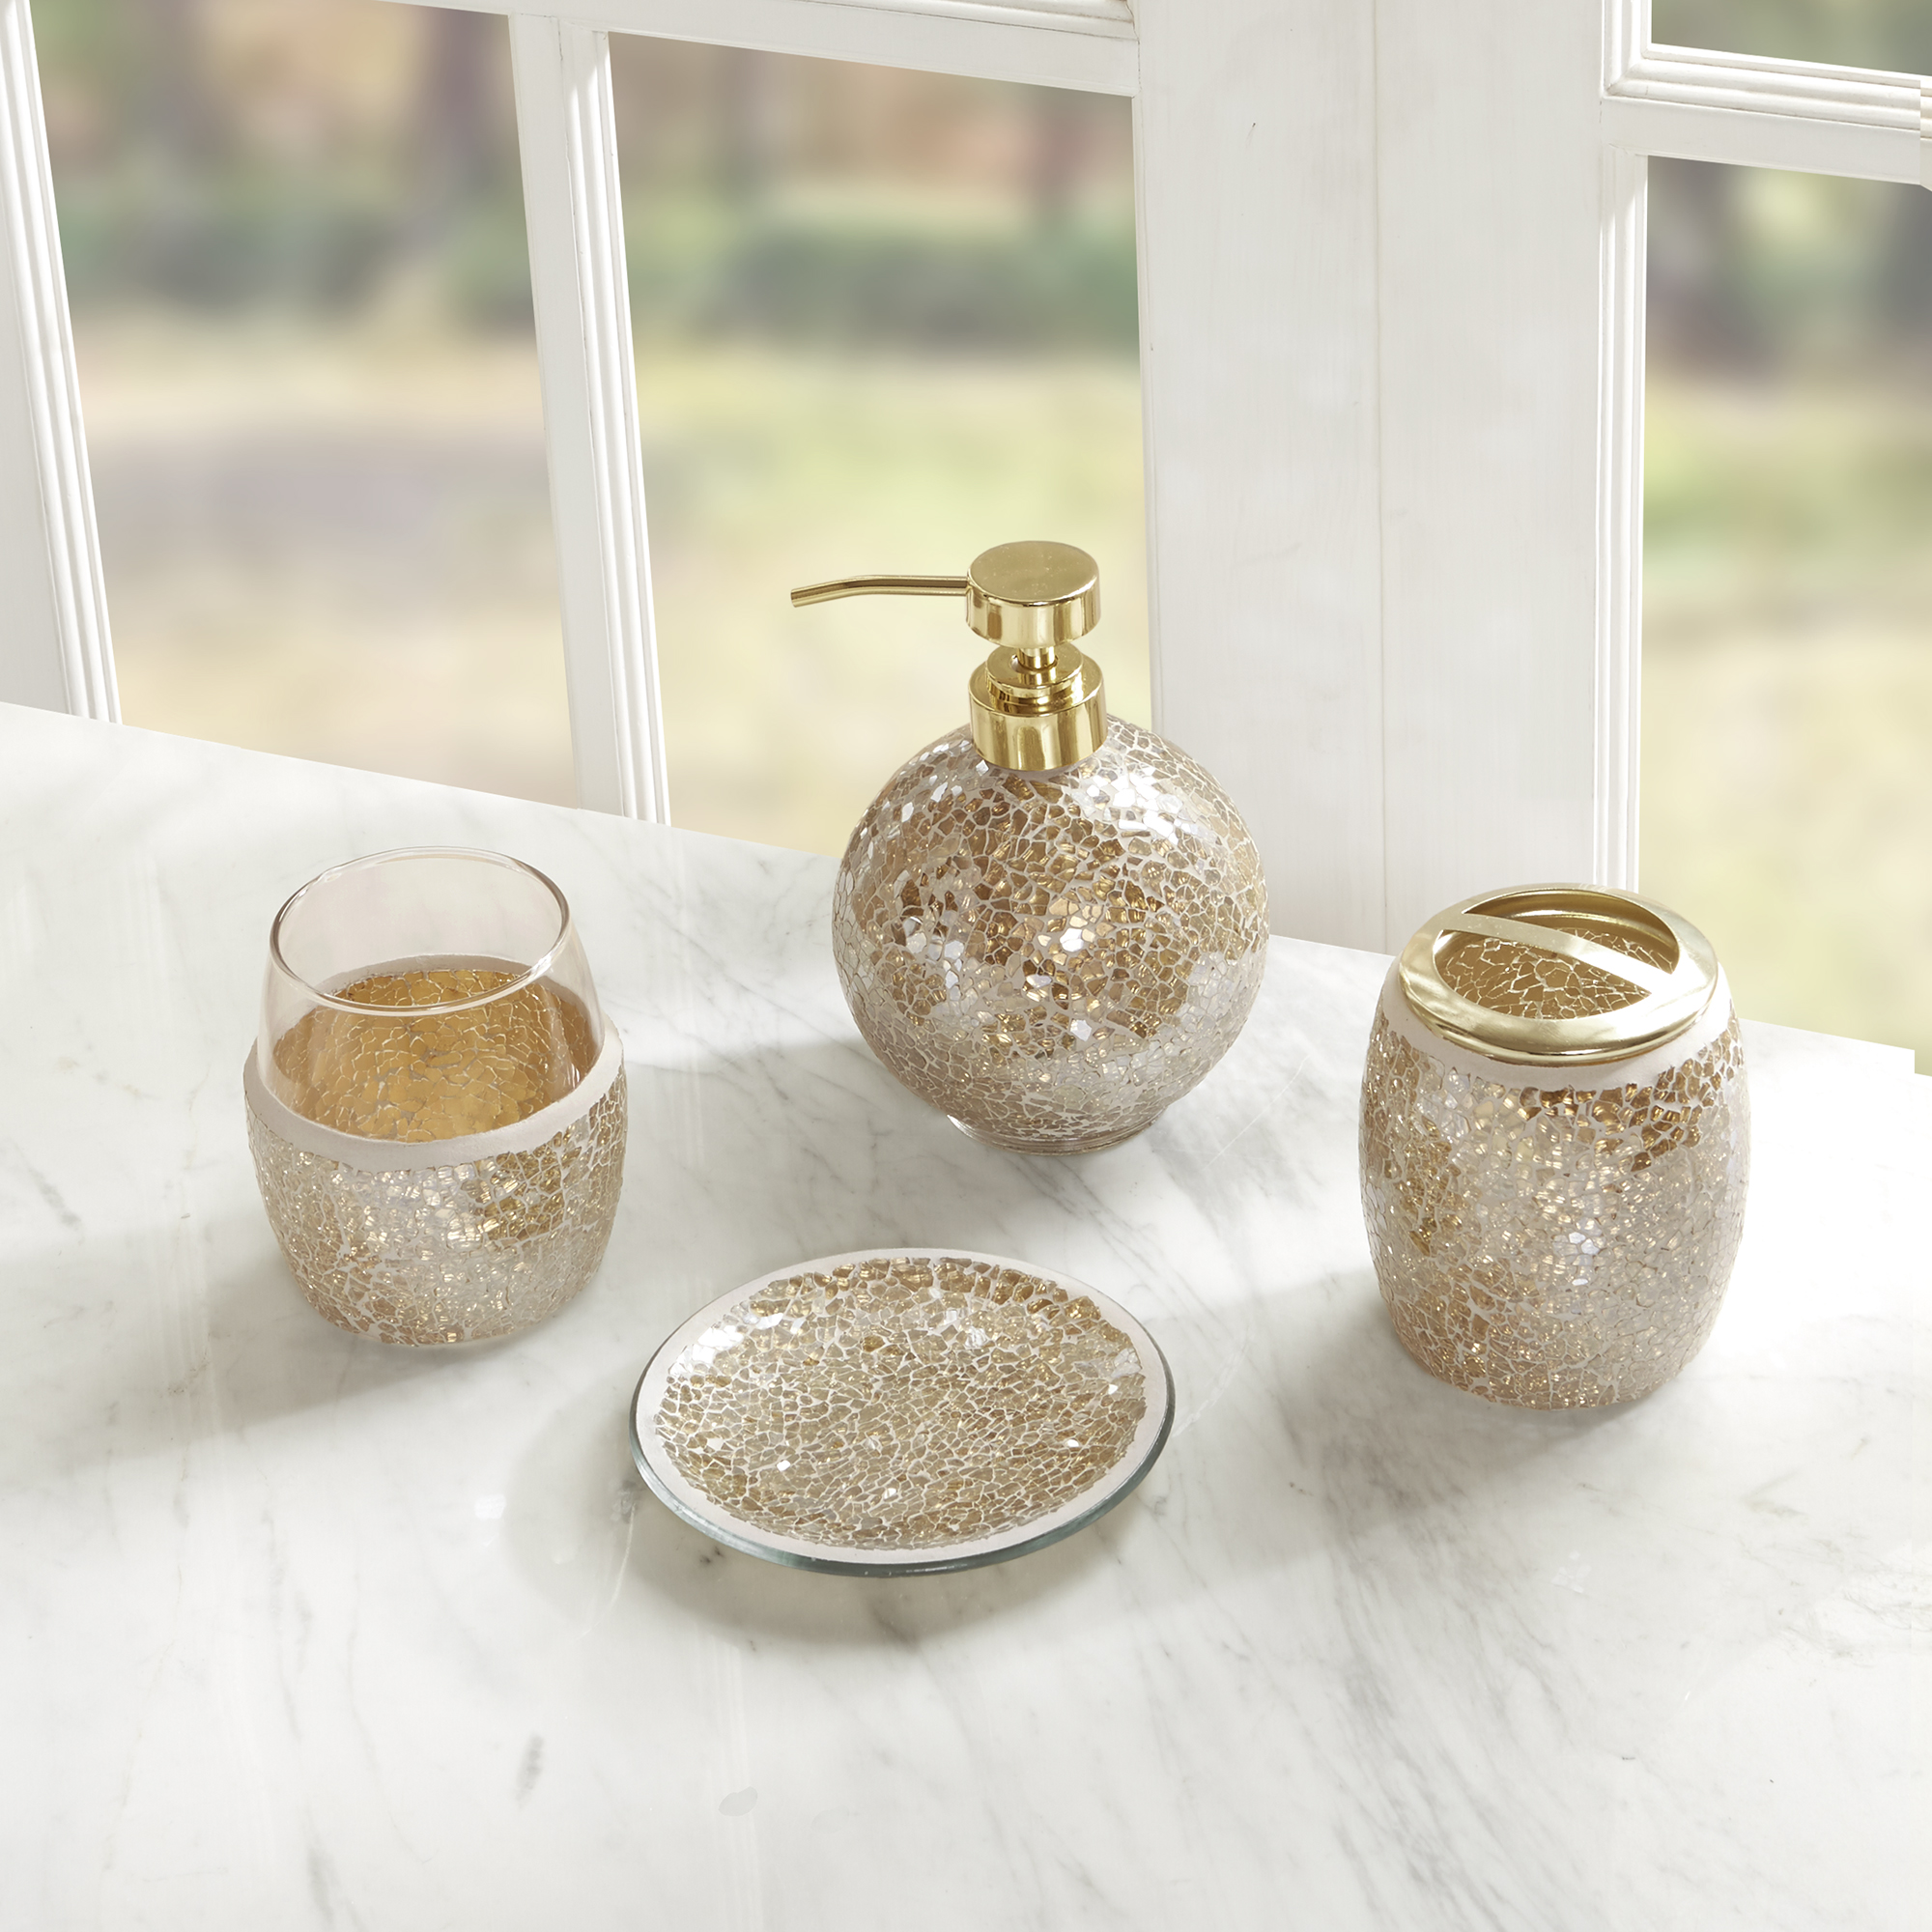 Home Essence Mosaic Four Piece Bath, Madison Park Bathroom Accessories